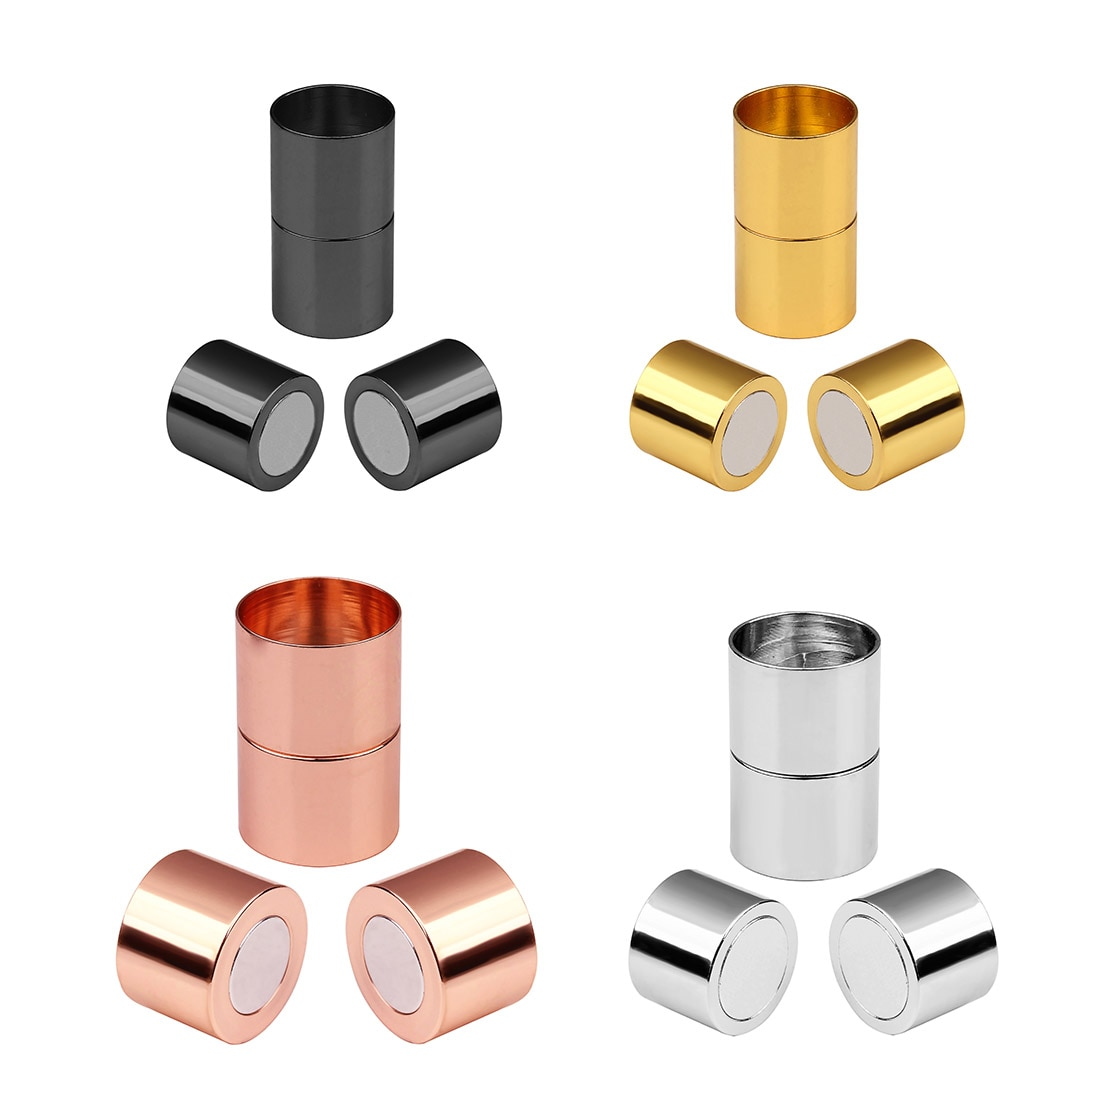 5Sets Magnetic Clasps 3-15Mm Gold Rhodium Color Leather Cord Bracelets Clasp Connectors End Cap For